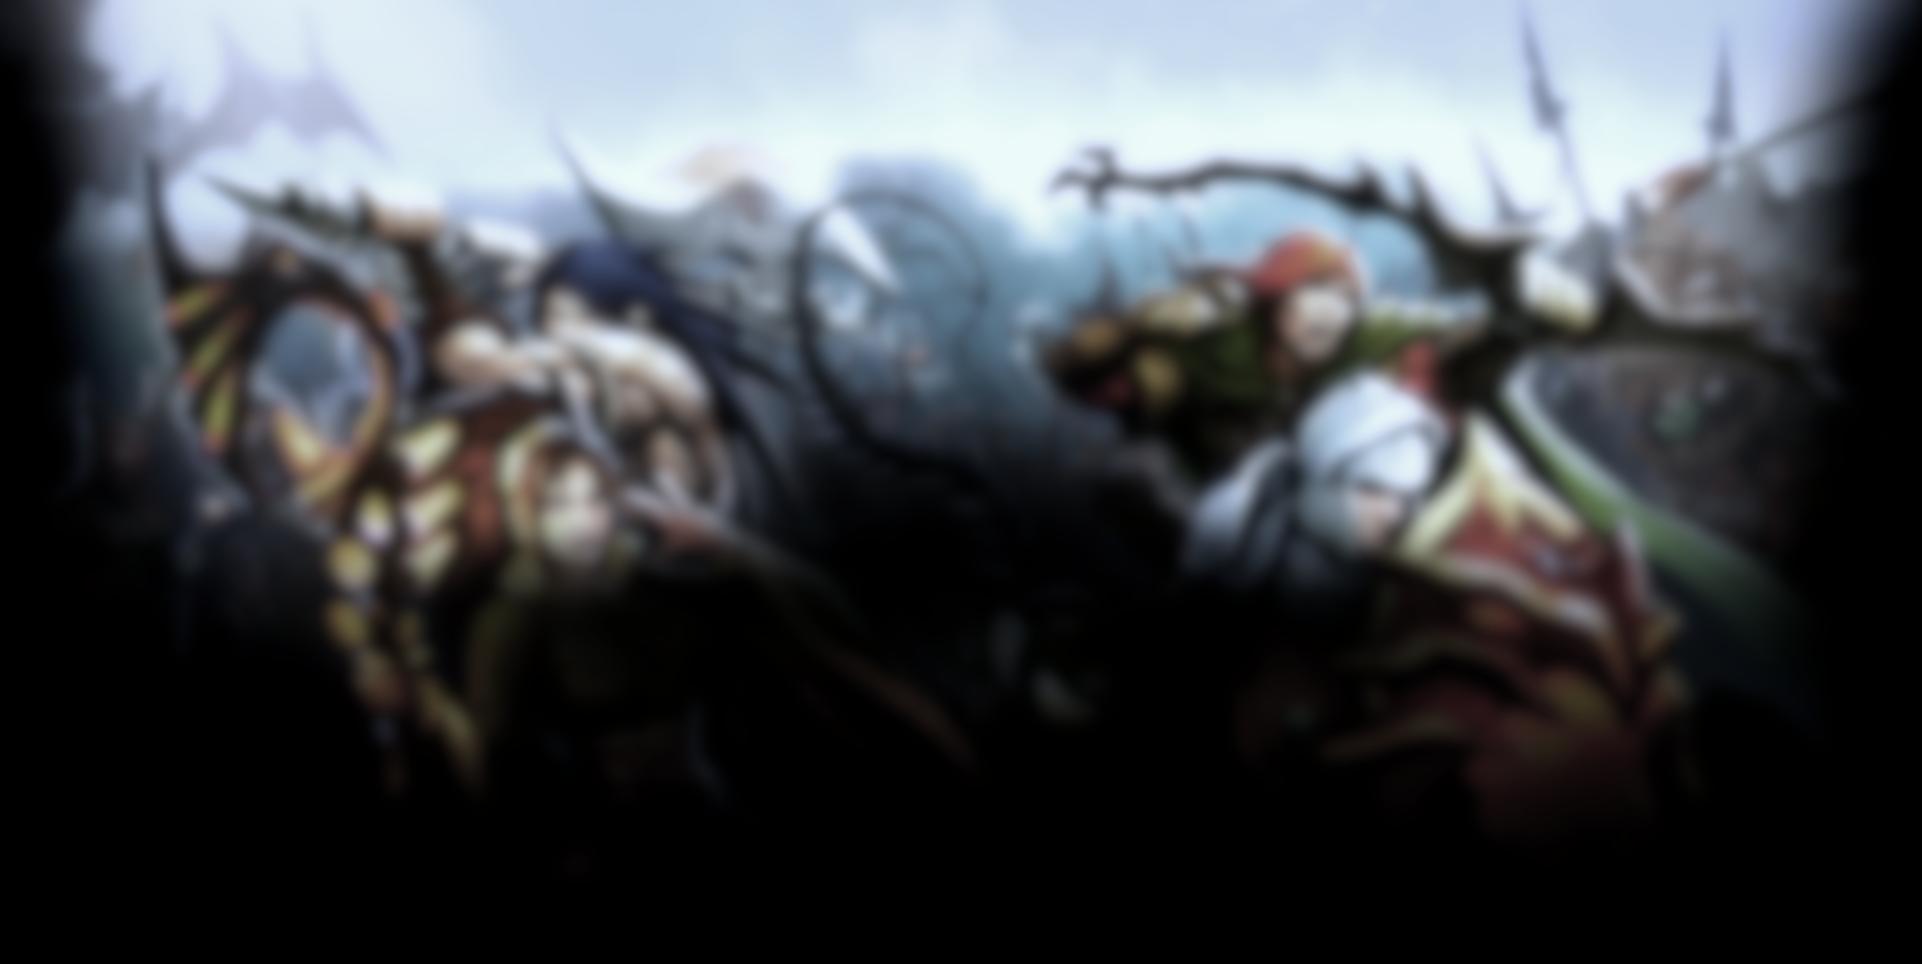 EverythingRS - Runescape Private Server Toplist